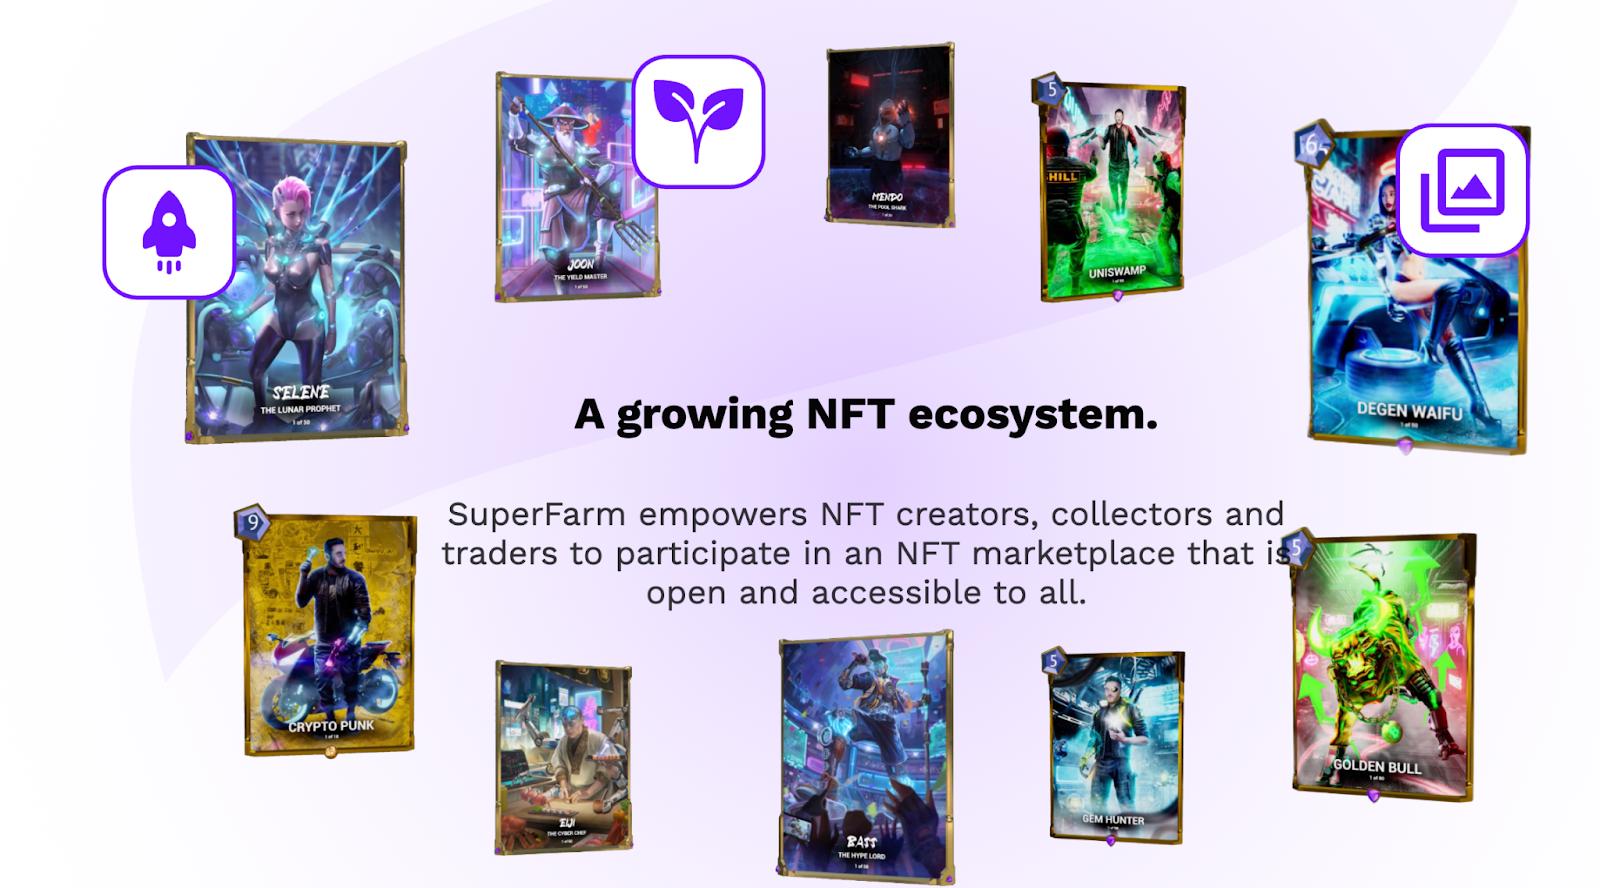 An image of the vast SuperFarm NFT ecosystem